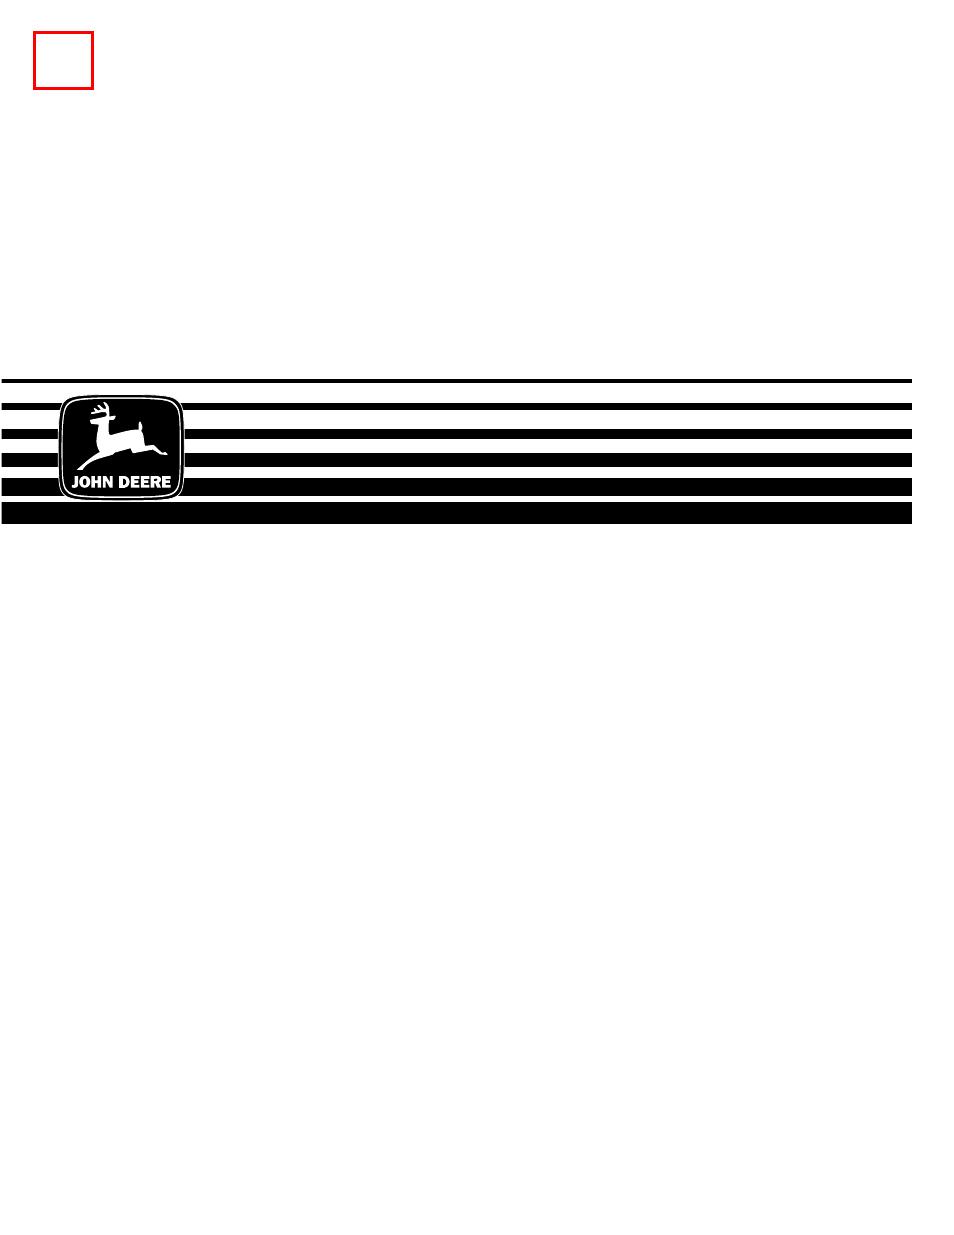 medium resolution of john deere stx38 user manual 314 pagesstx38 wiring diagram 11